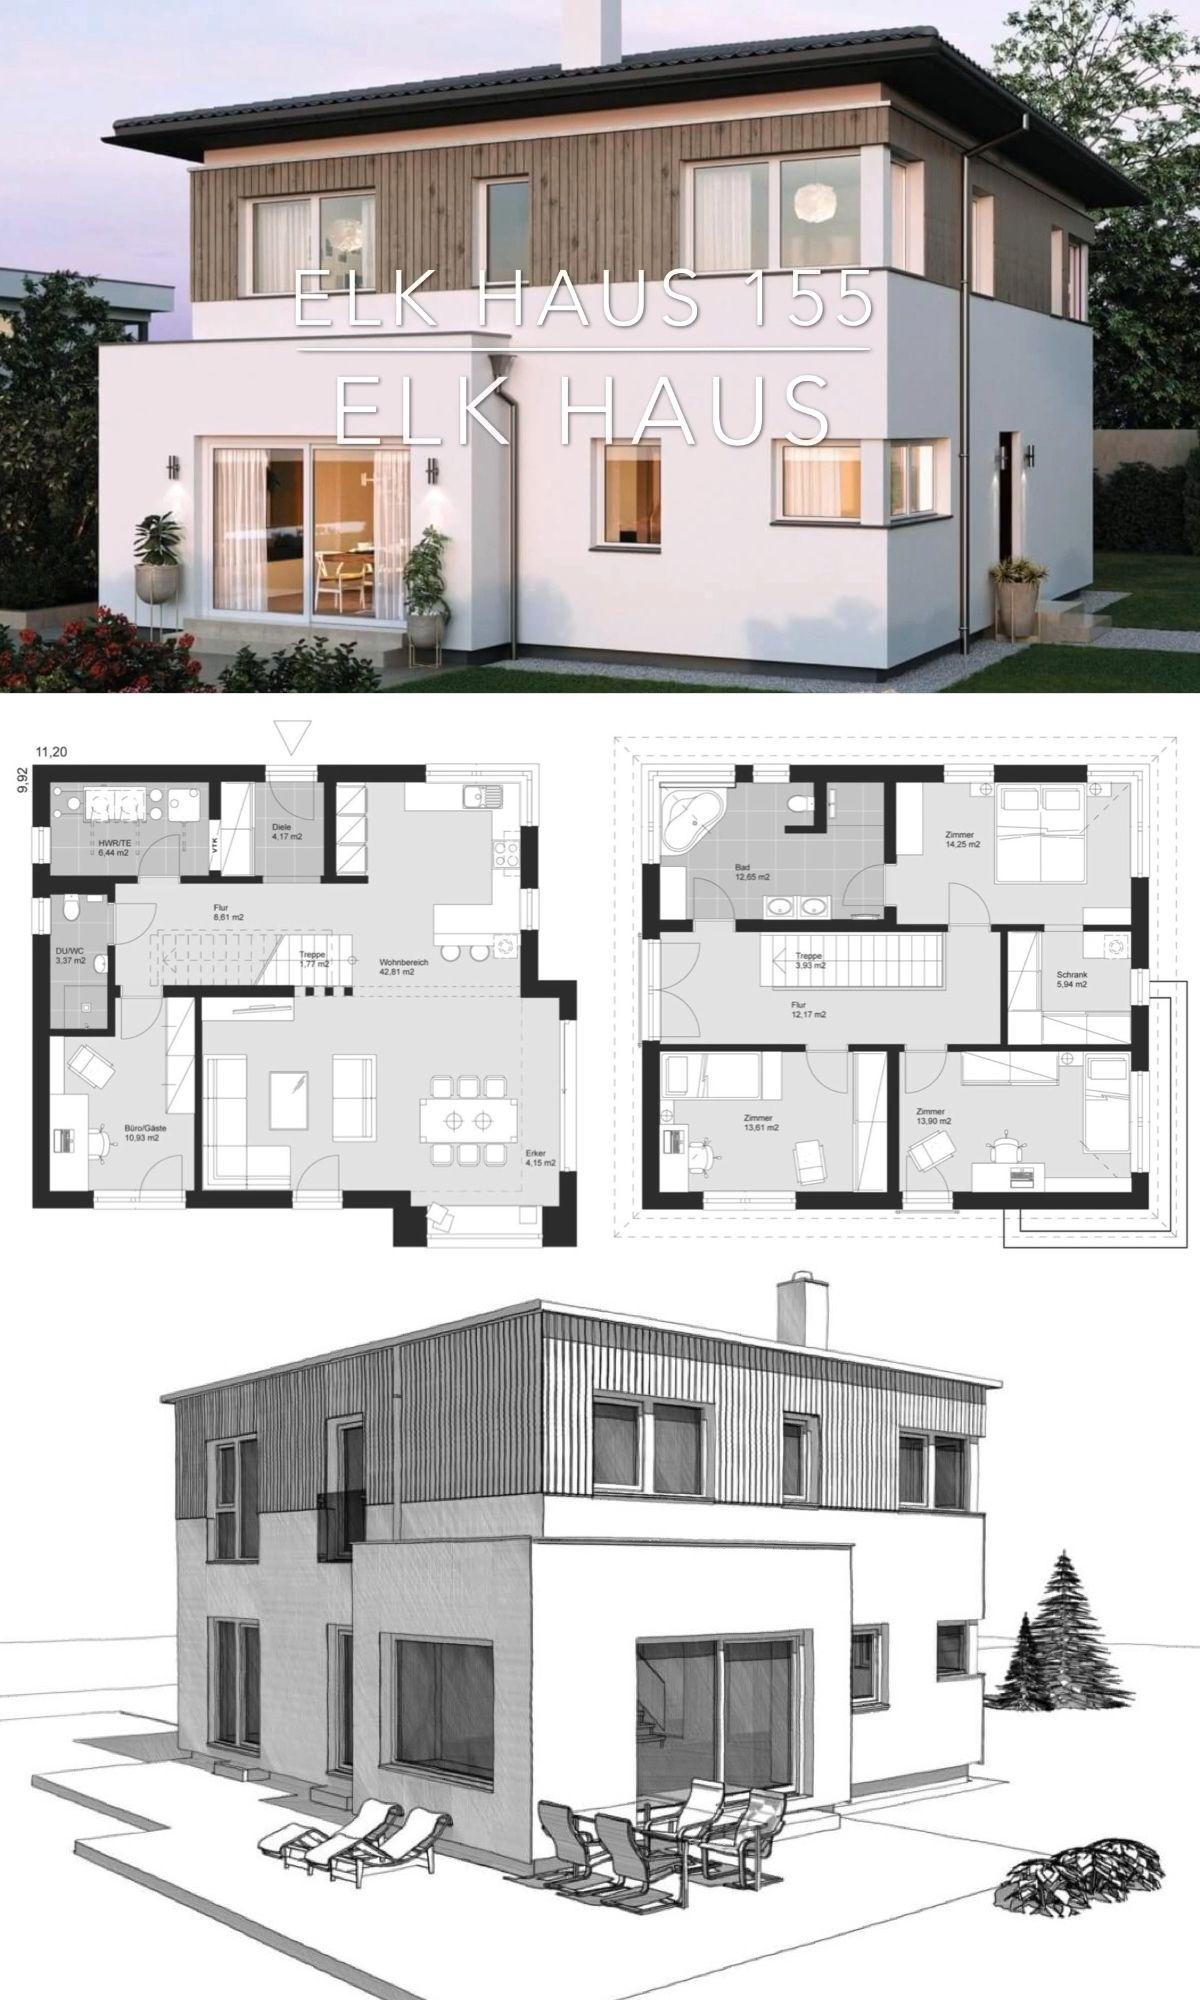 Modern European Architecture House Plan – Elk Haus 155